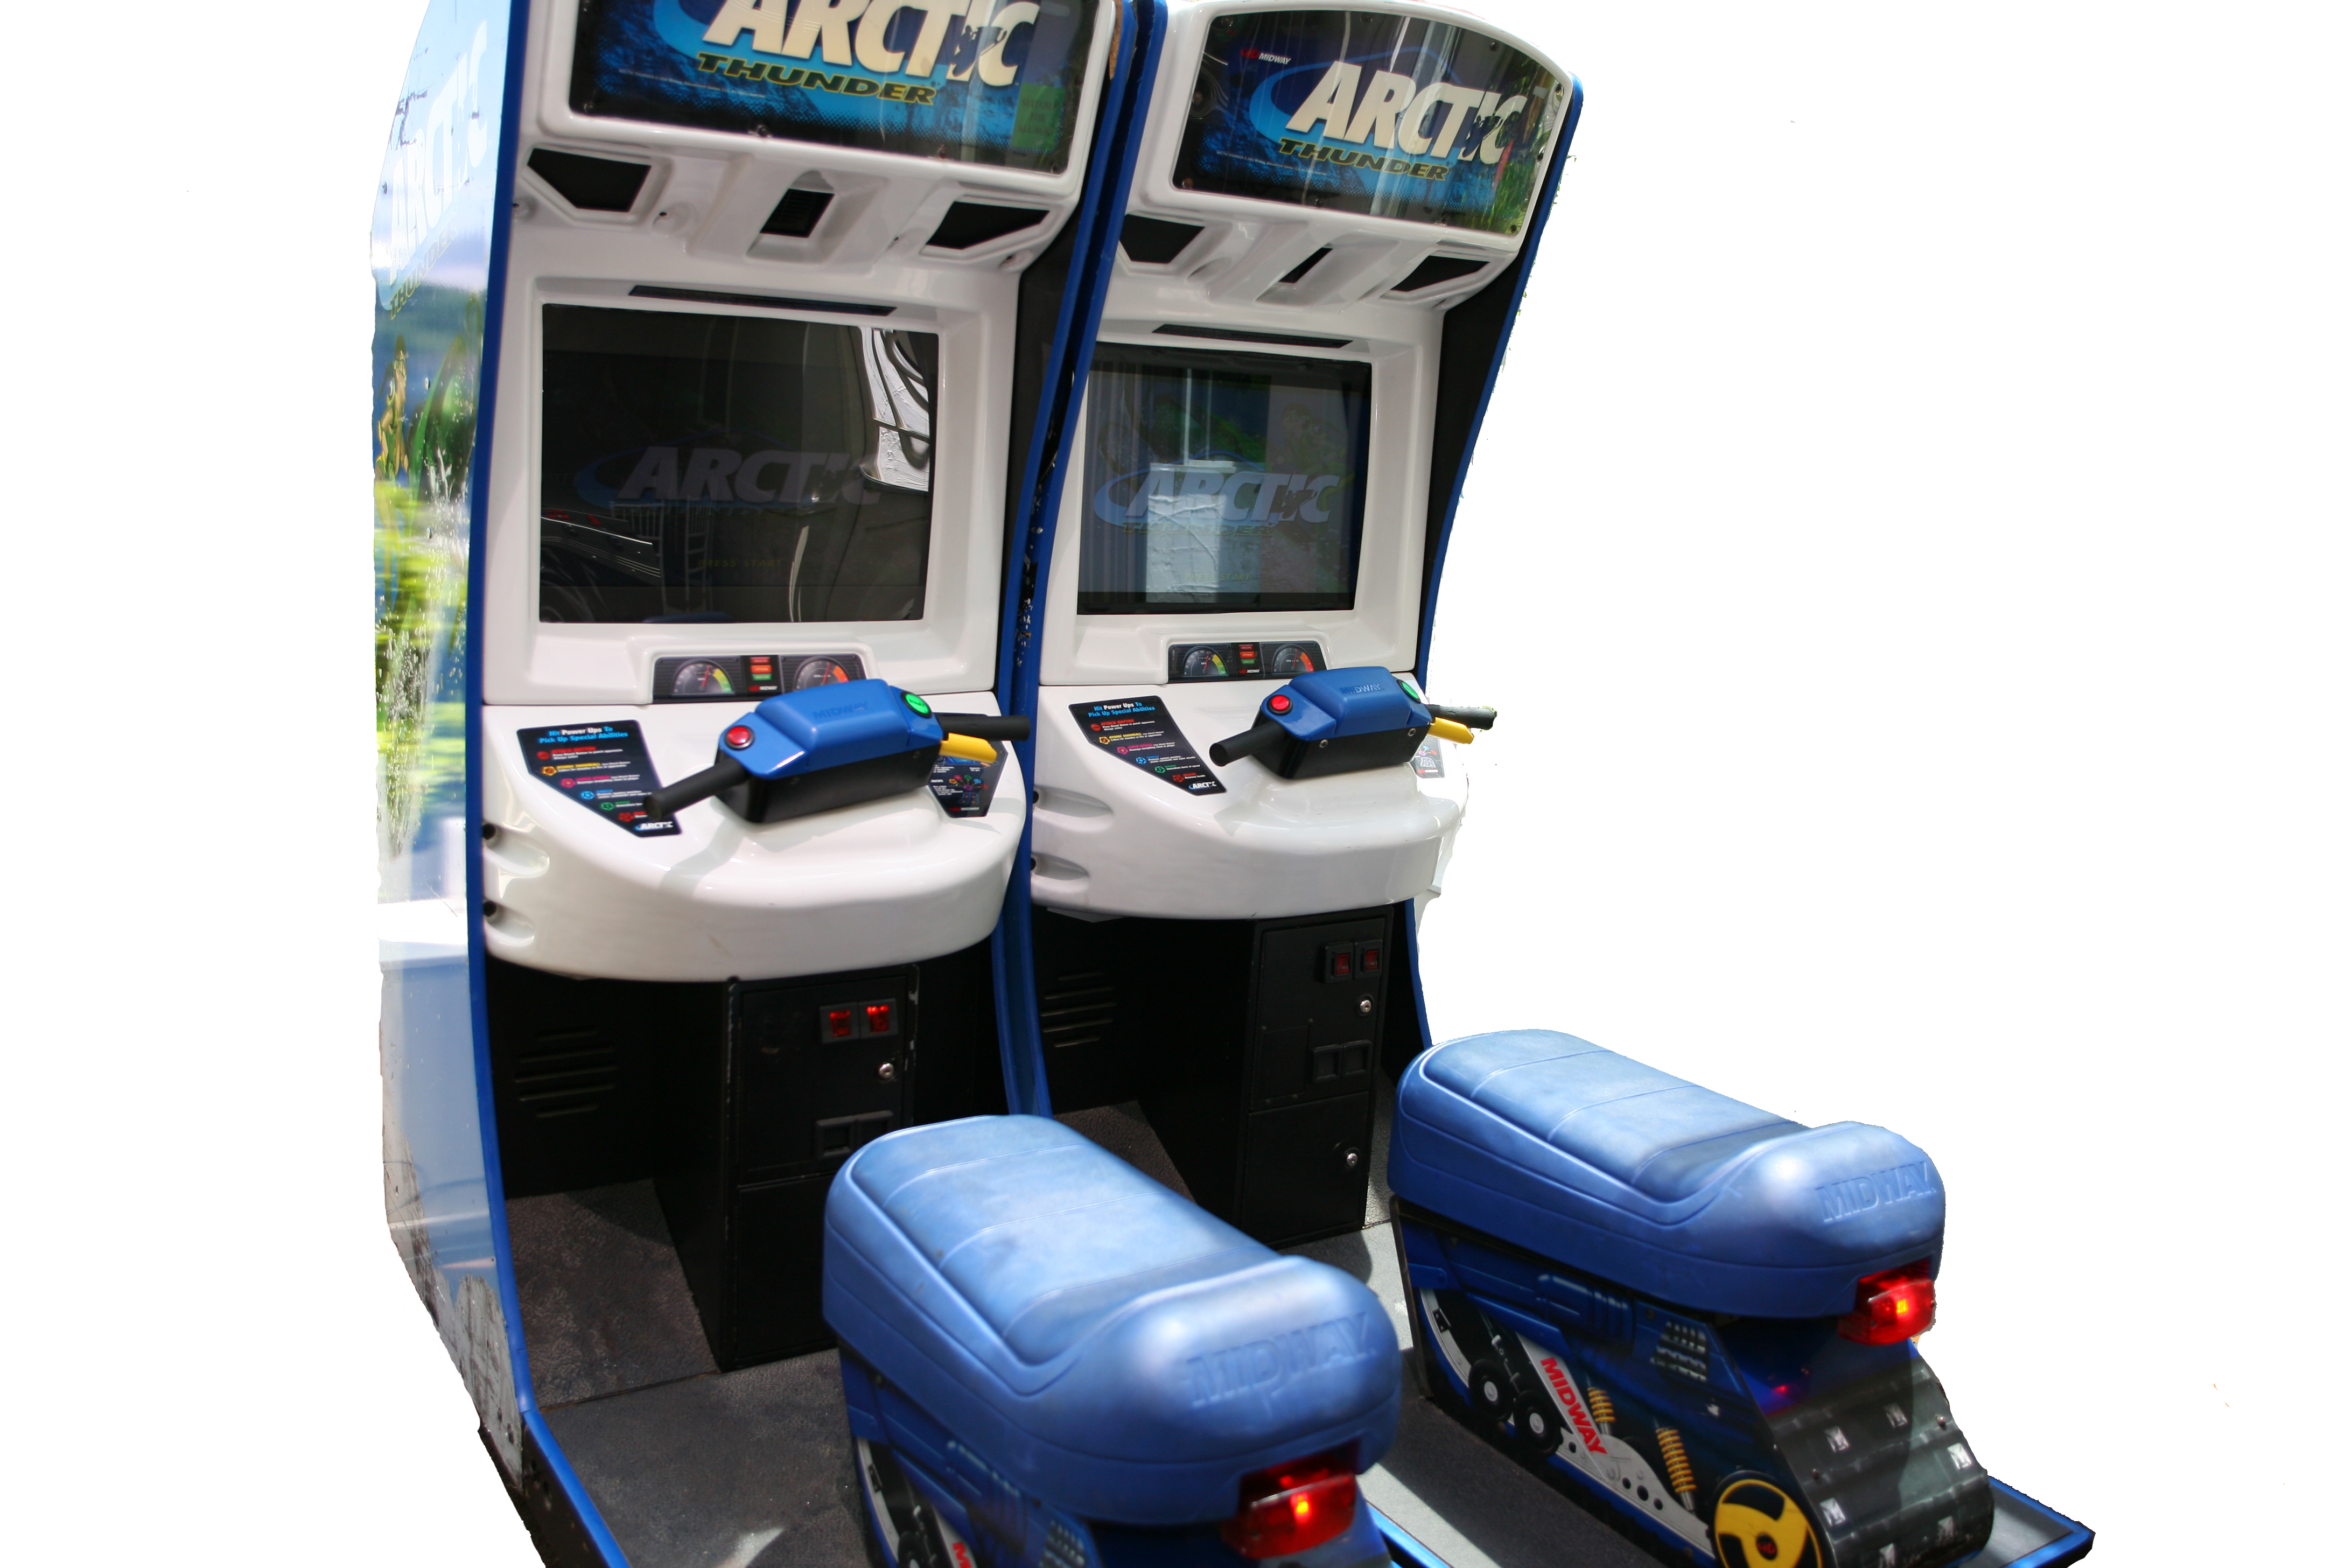 Arctic Thunder Snow Machine Simulator